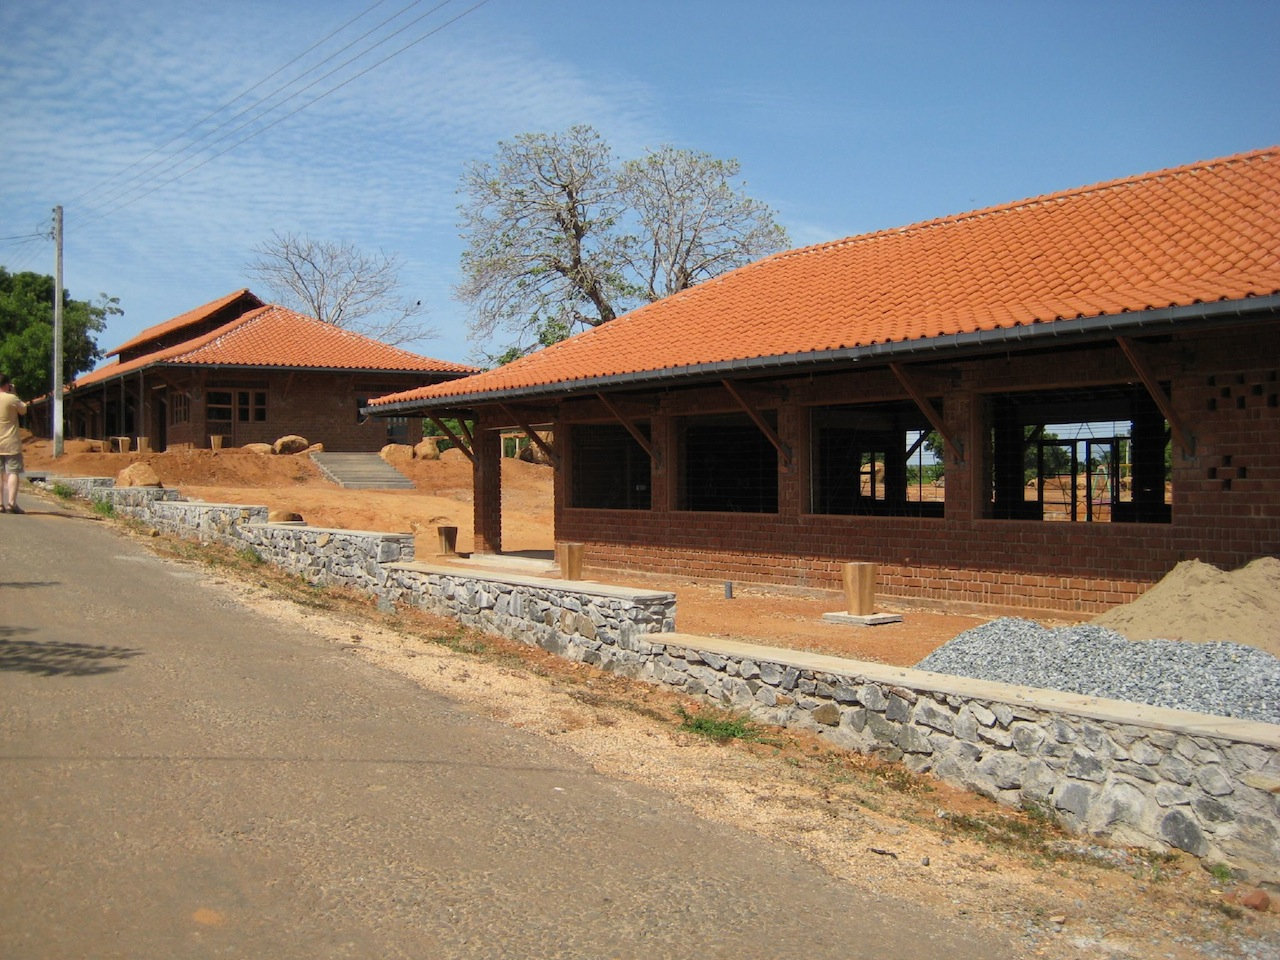 Yodakandiya Community Complex, Sri Lanka (2007) shortlisted for the 2010 Aga Khan Award for Architecture (Image via Wikimedia)